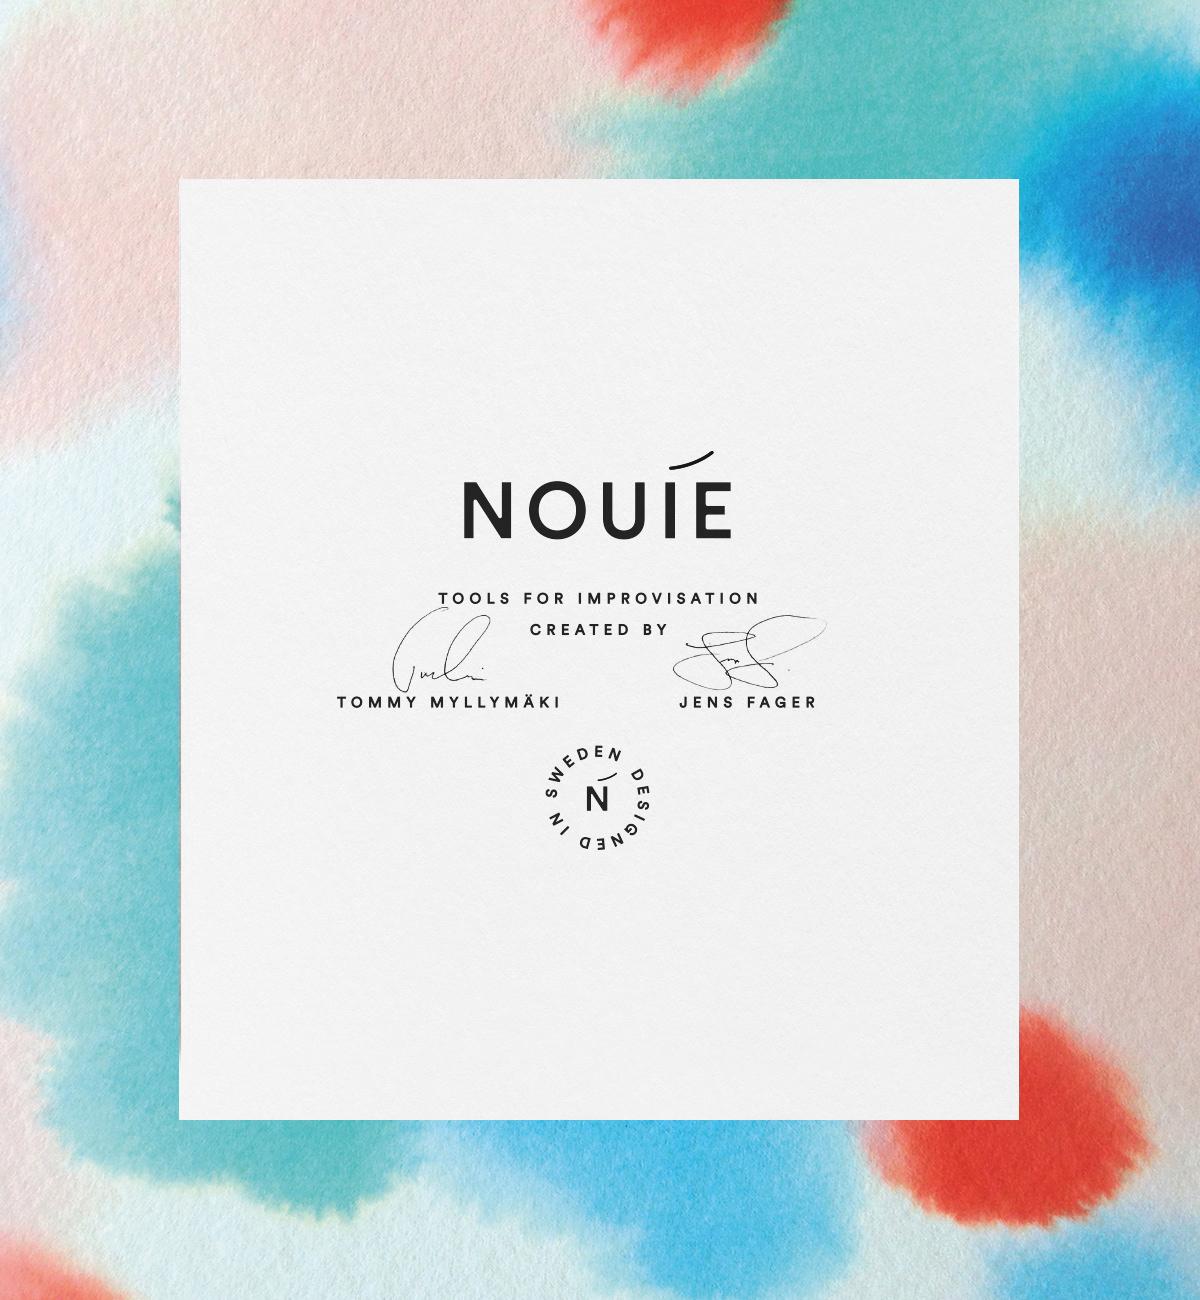 NOUIE